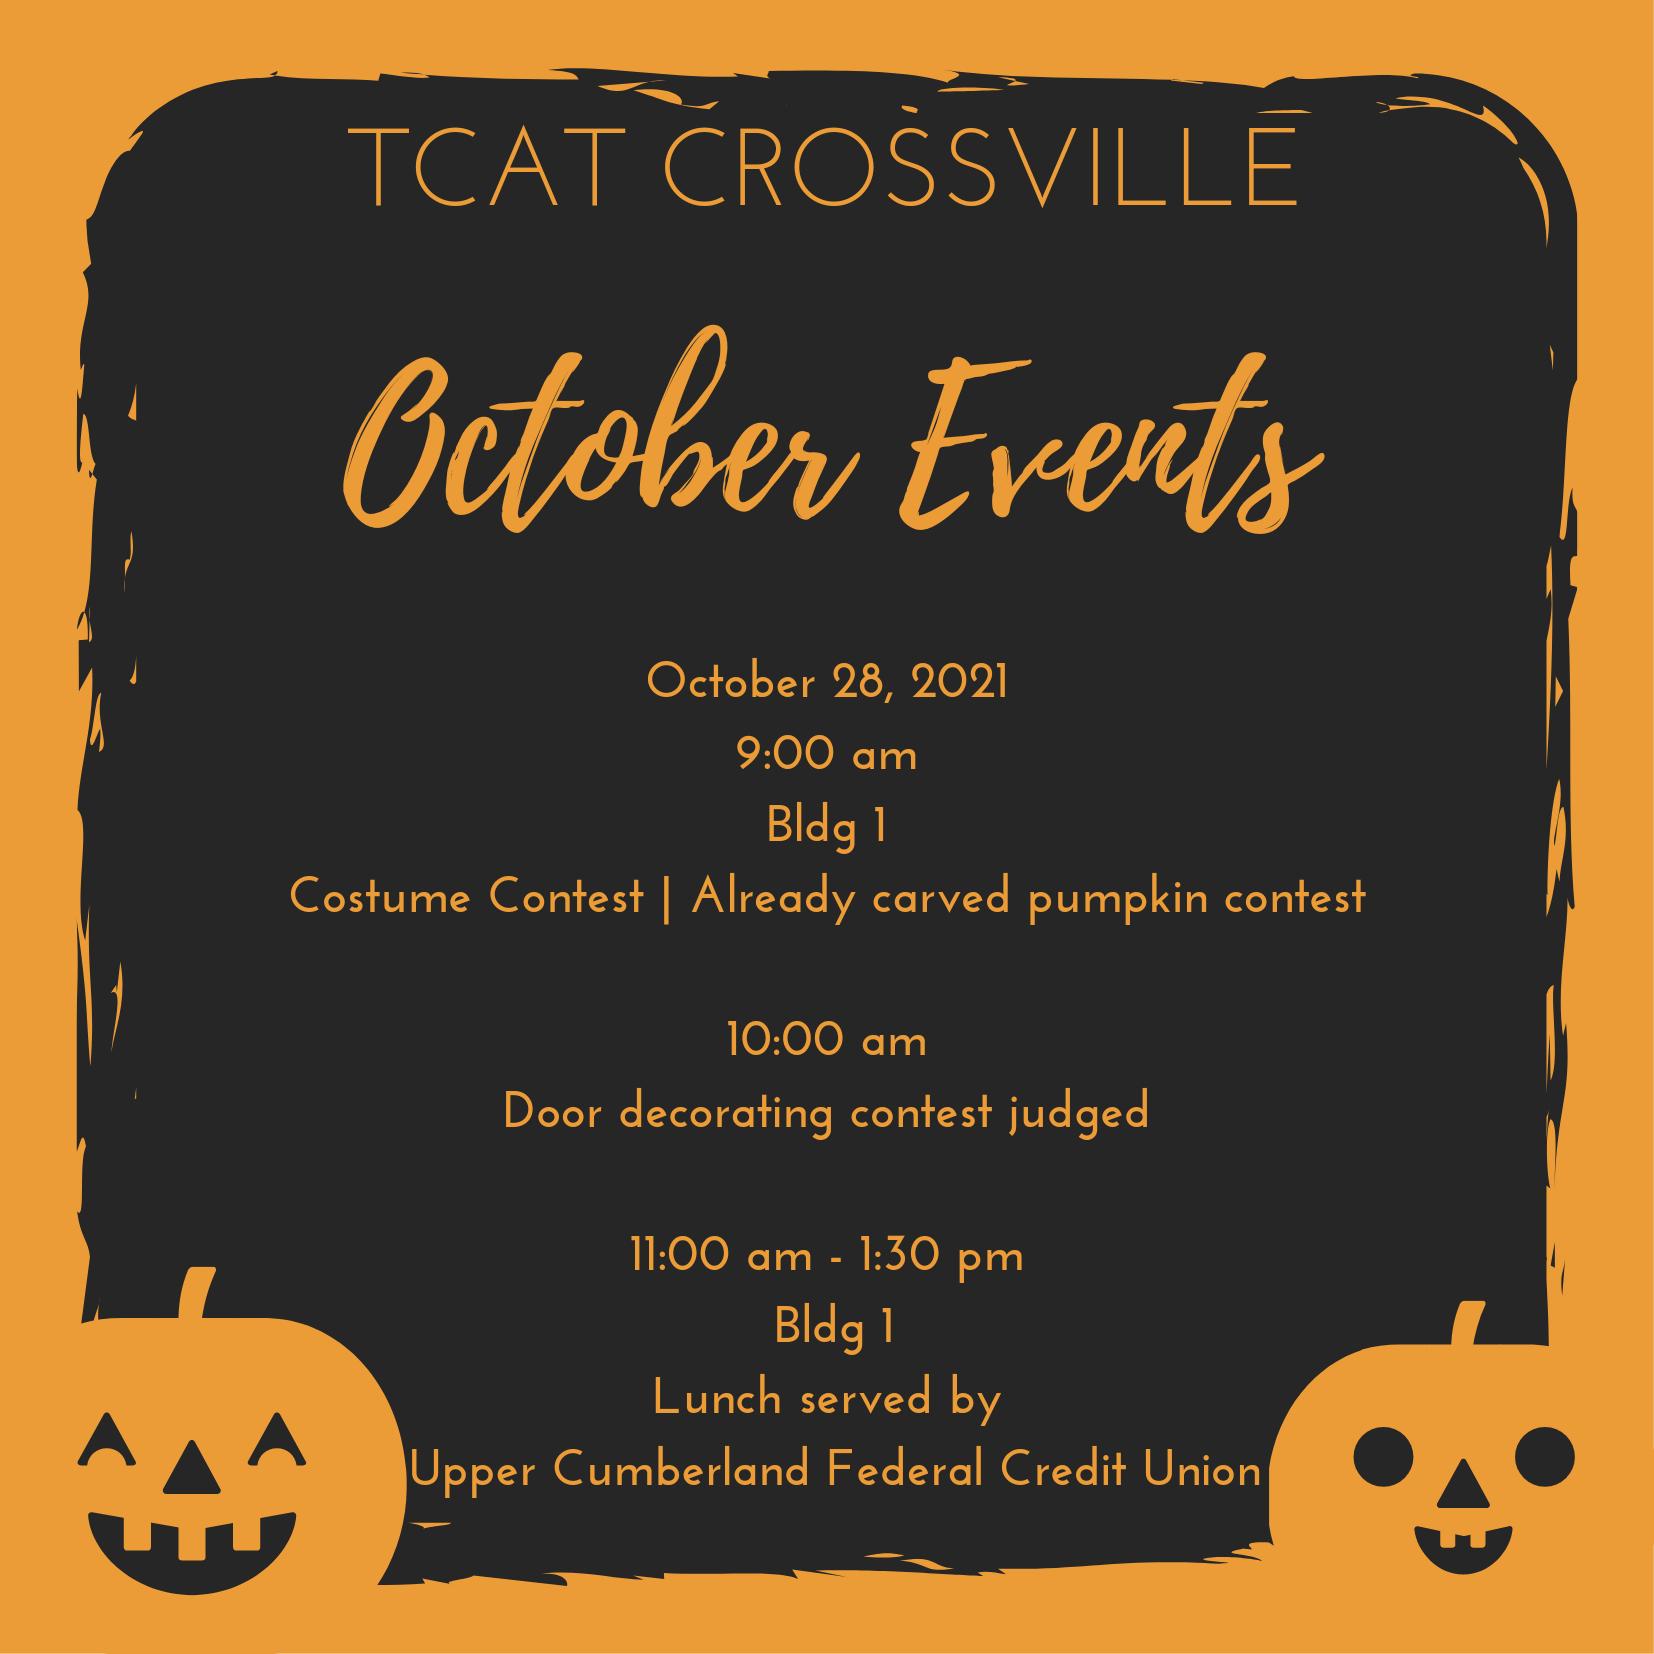 TCAT Crossville October Events